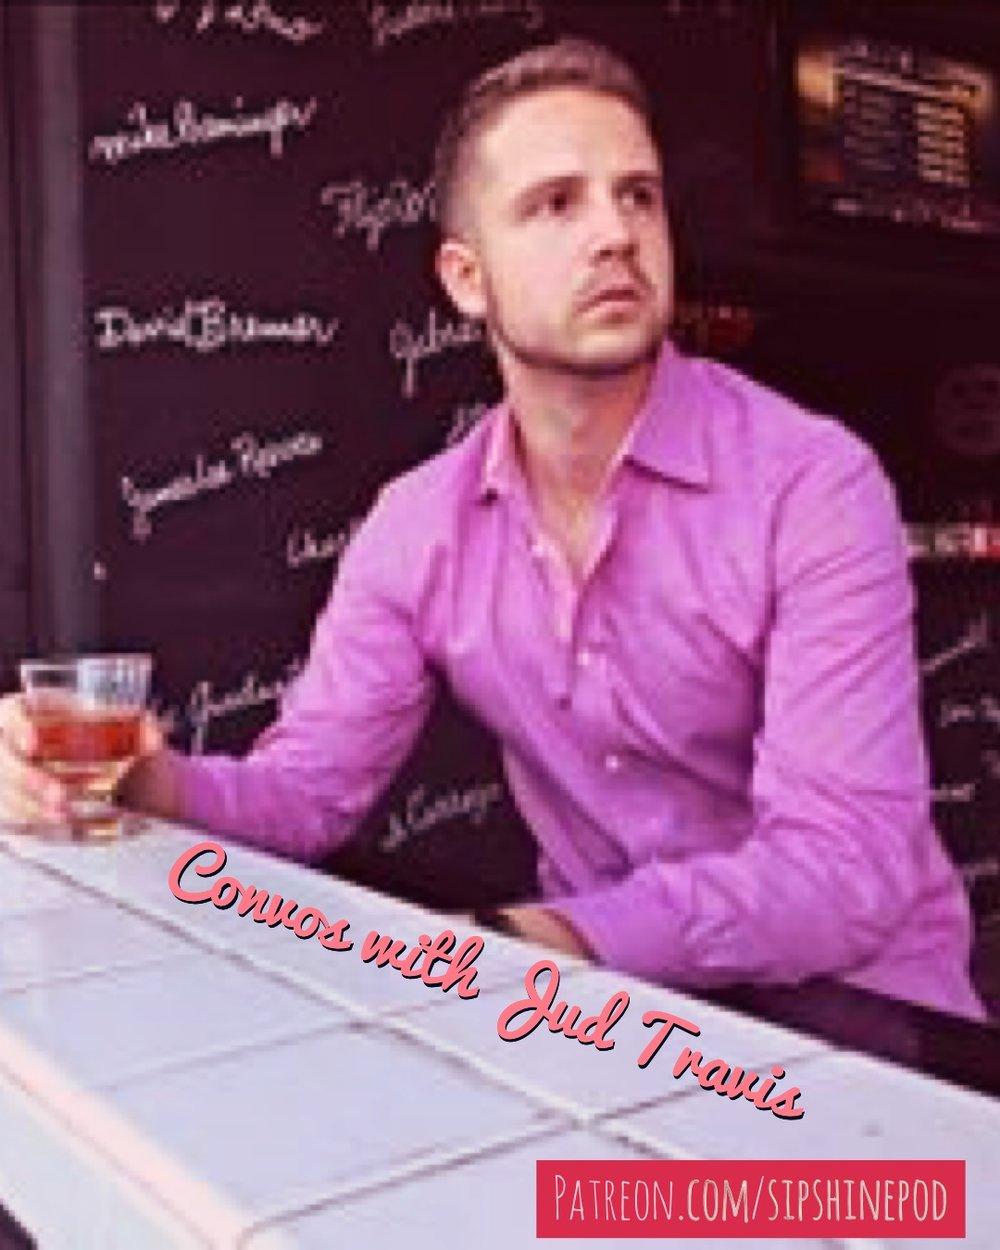 Jud Travis Cover Art.JPG